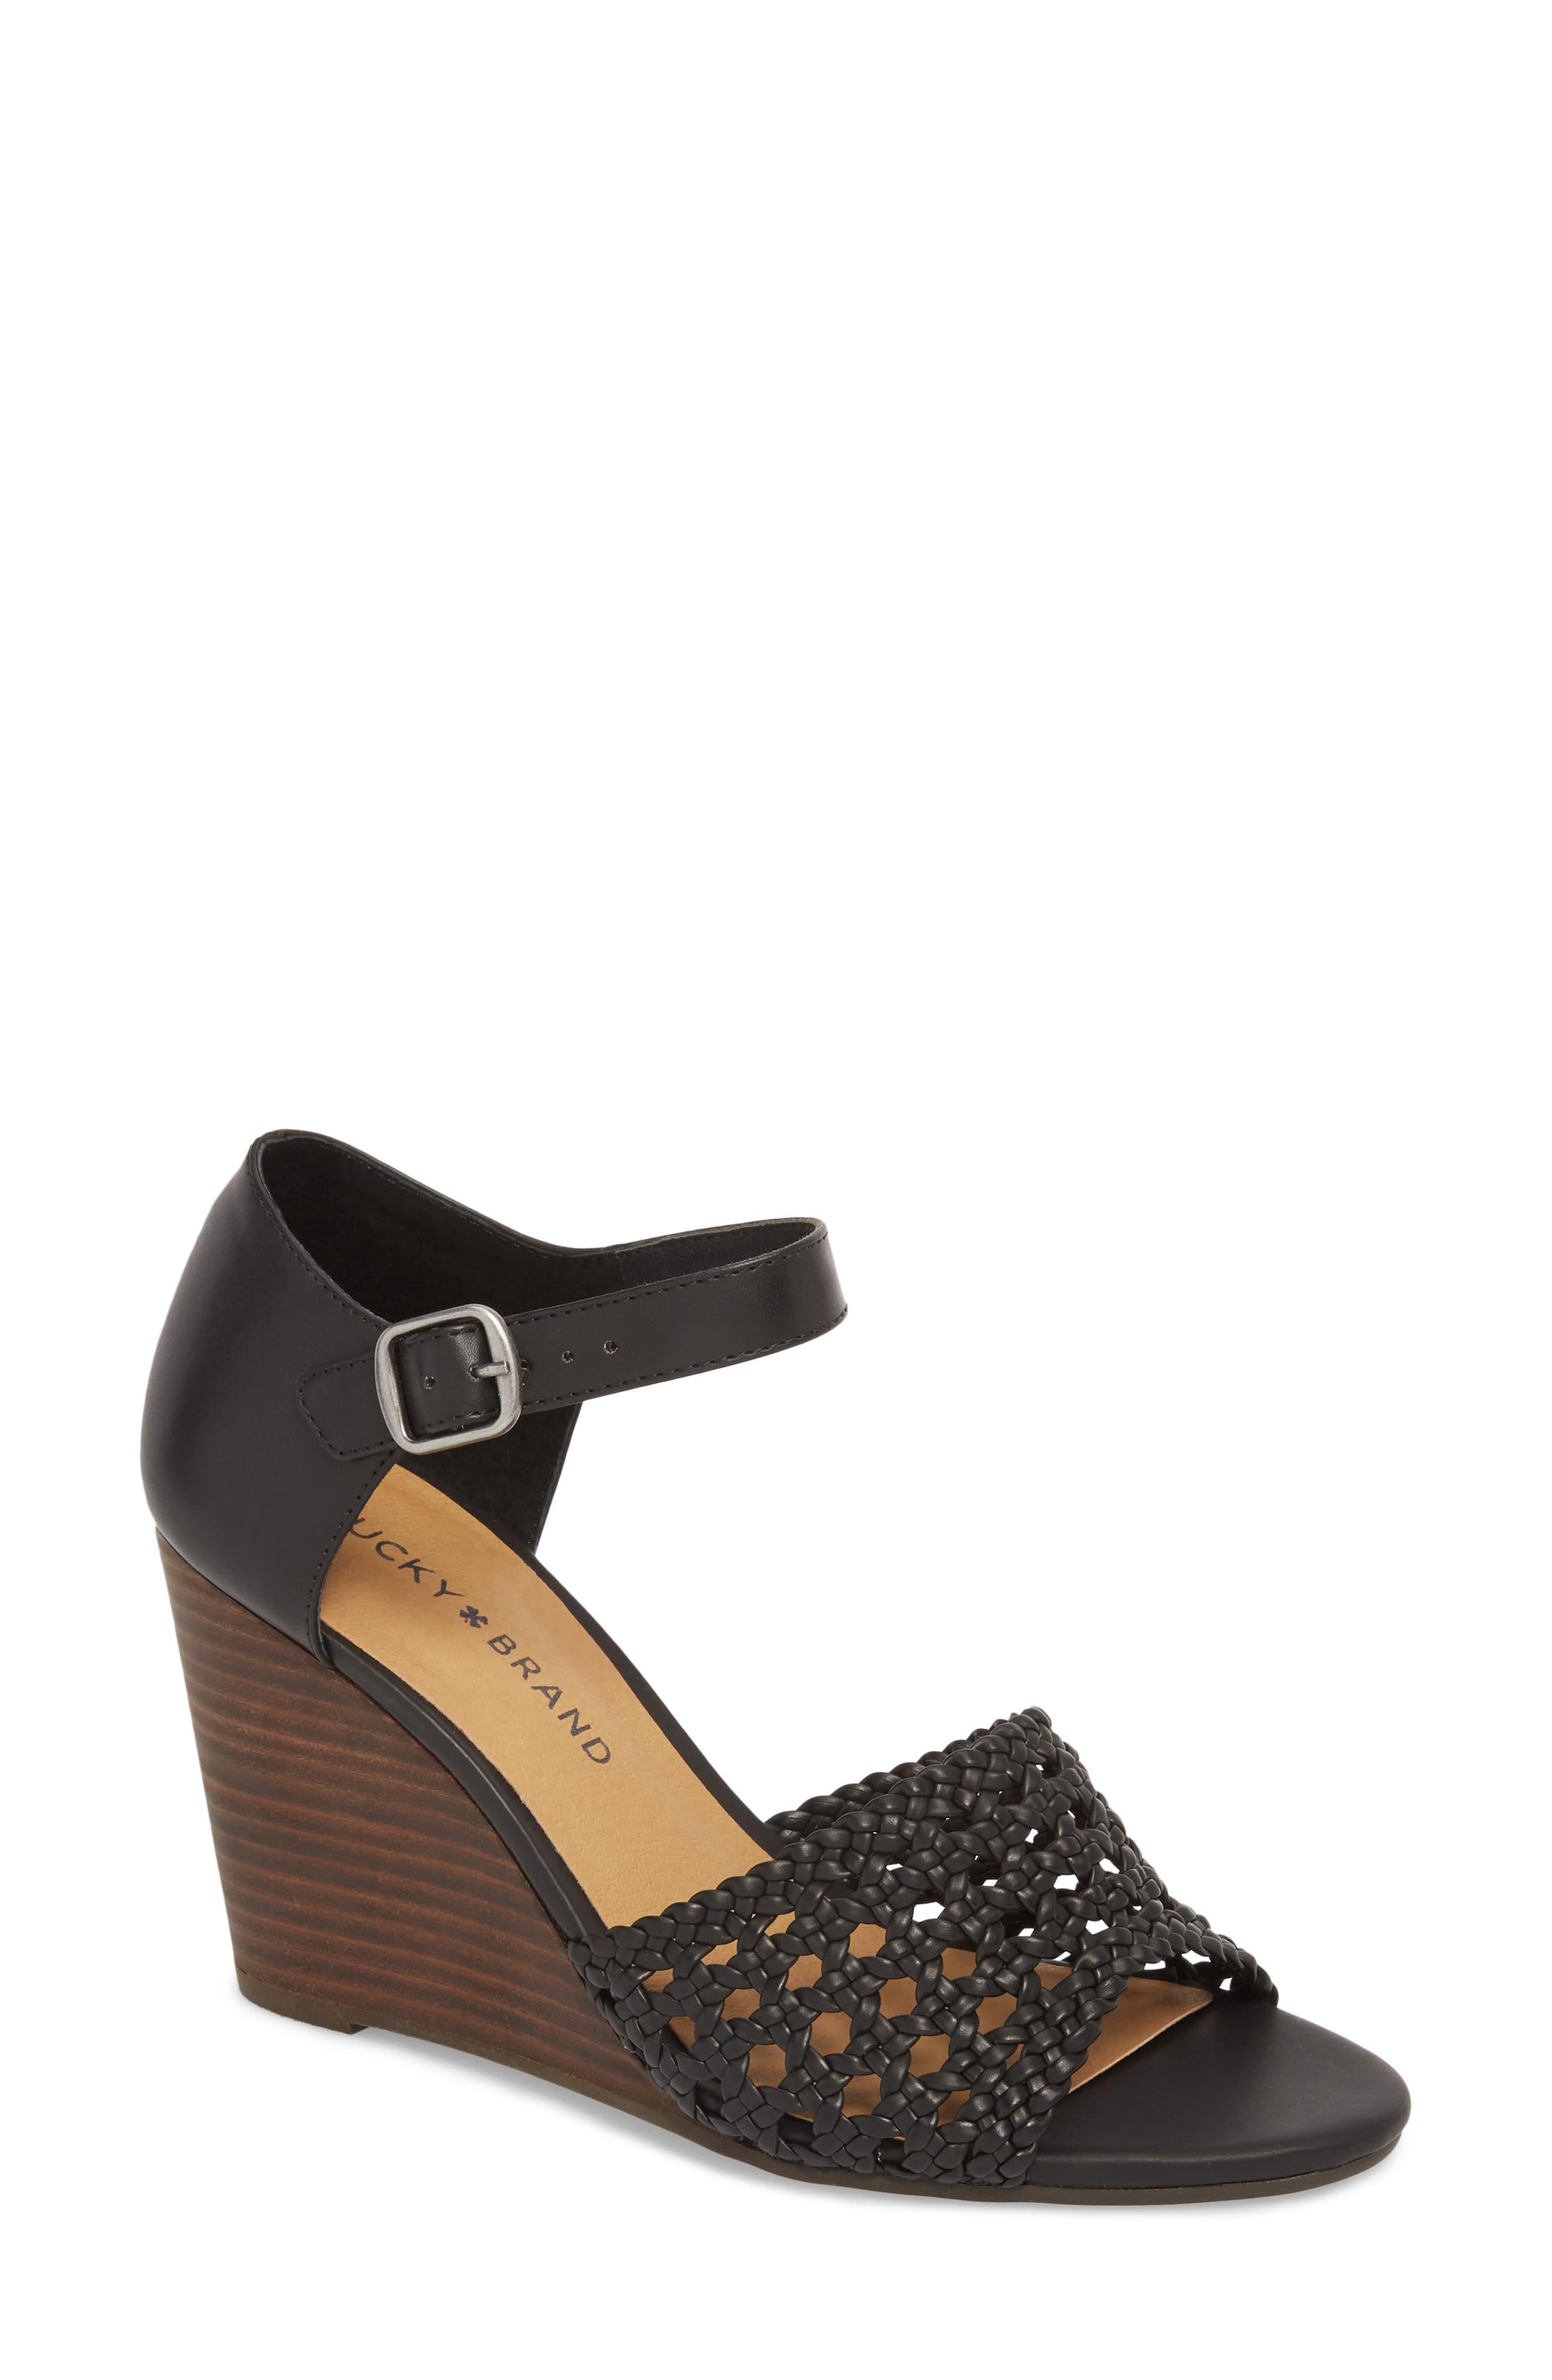 Lucky Brand Rabekka Wedge Sandal- Black